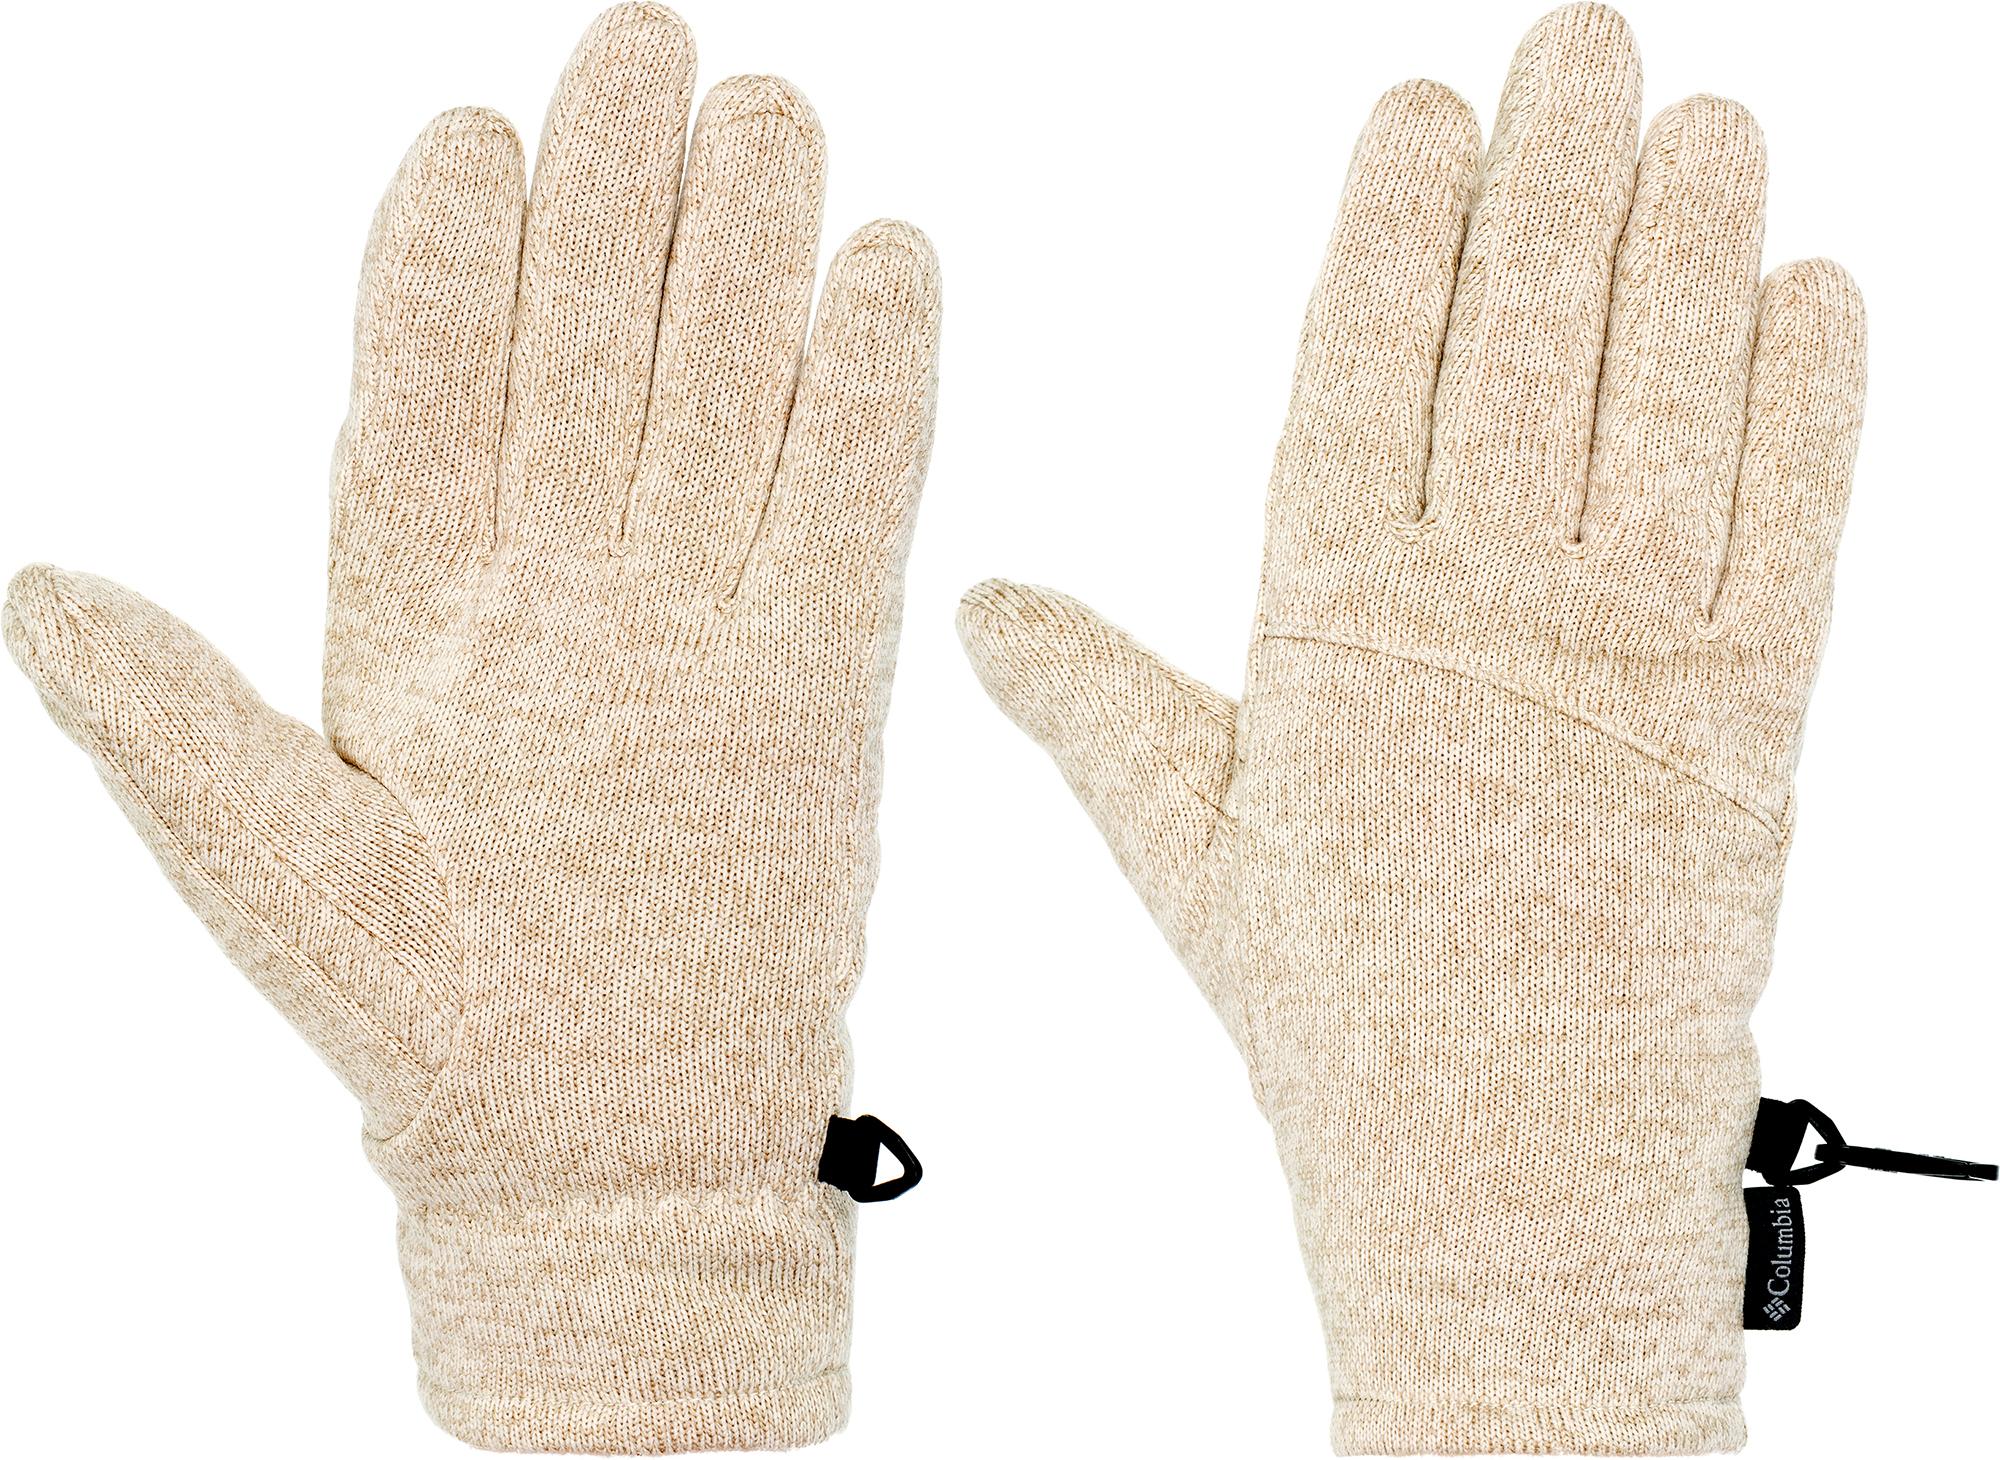 Columbia Перчатки женские Columbia Spruce Grove, размер 9 перчатки jetasafety jle021 9 l12